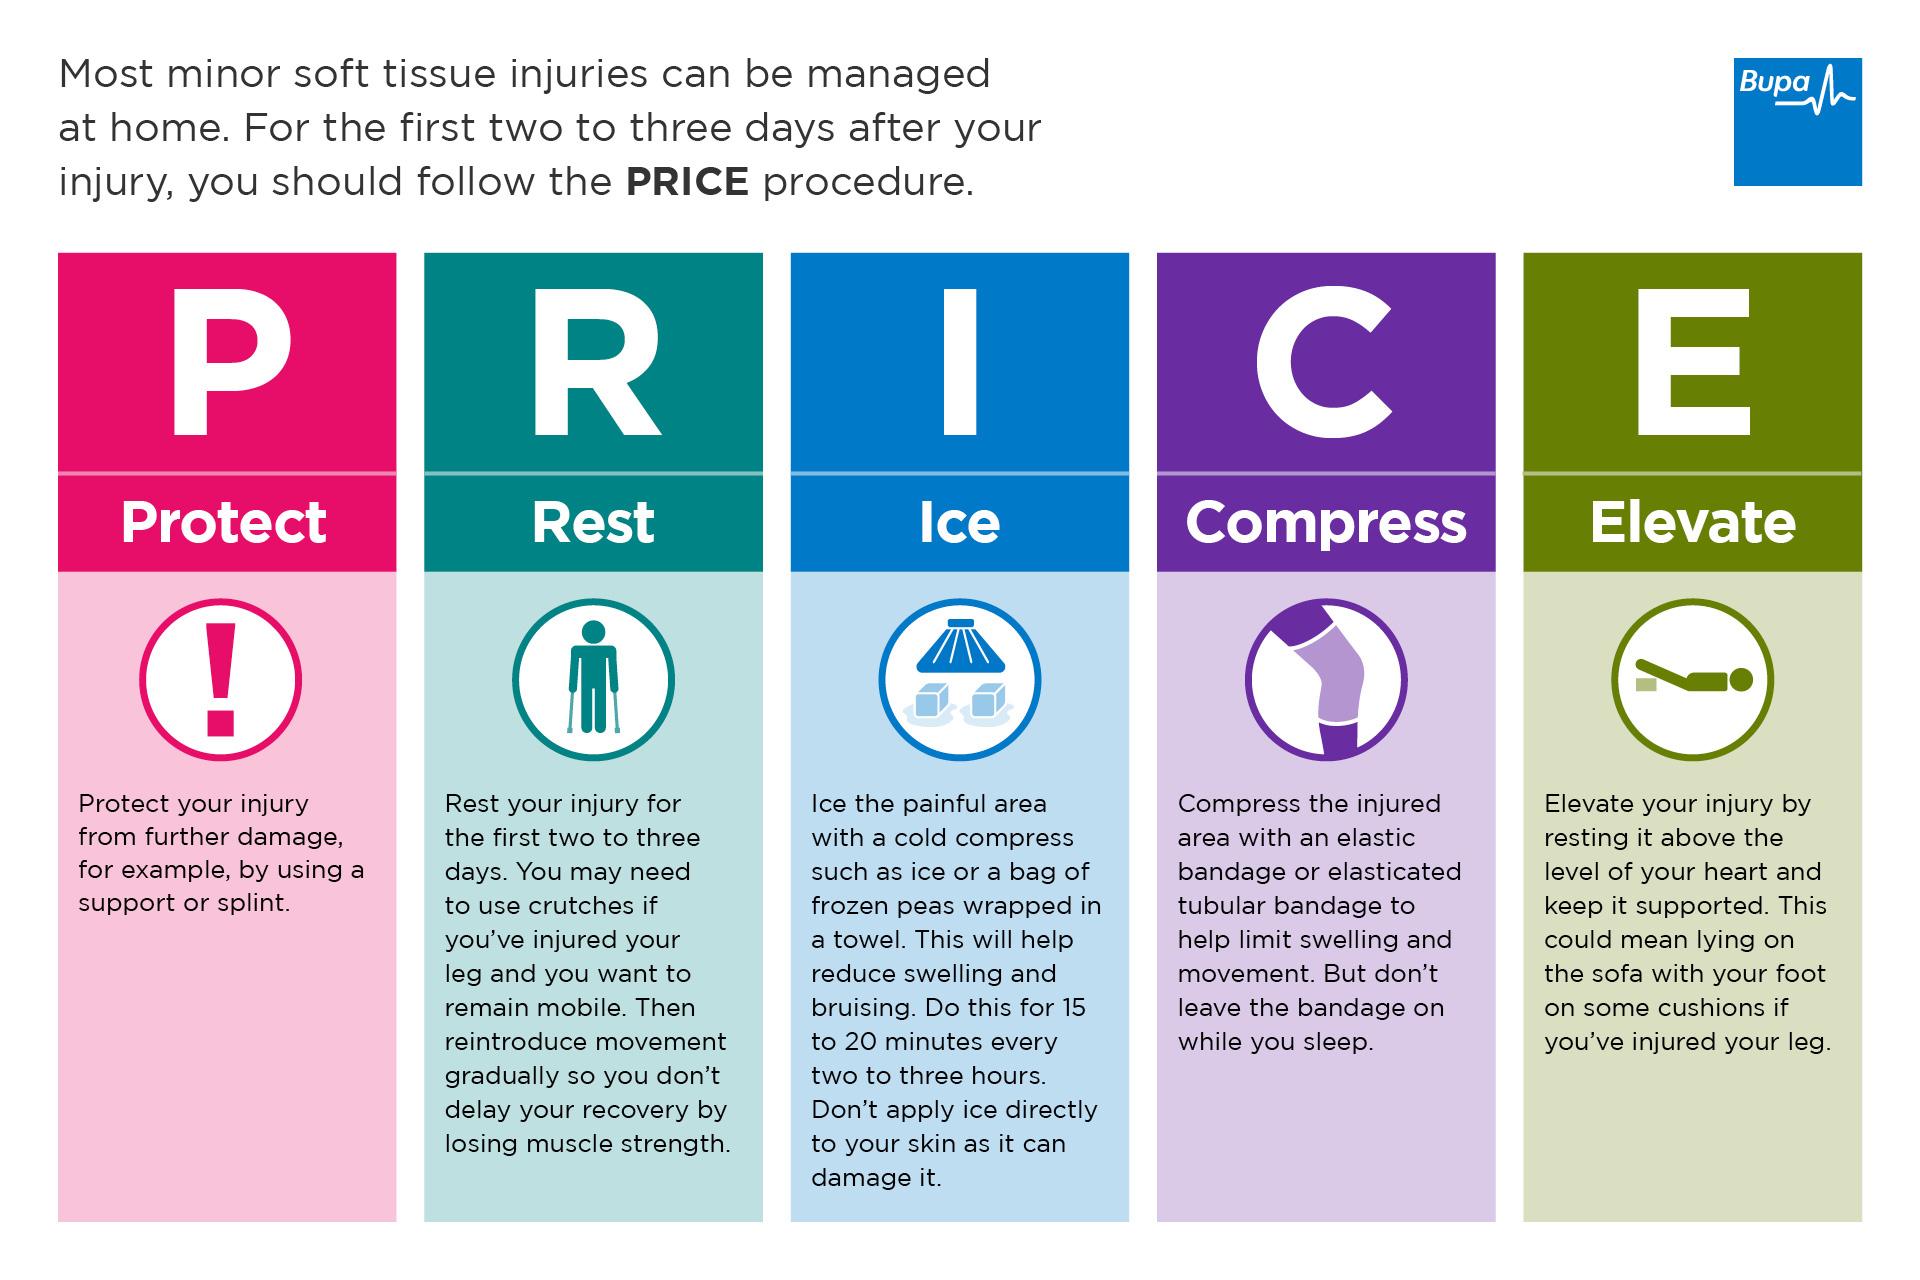 Acute Sports Injury Treatment Using P R C E Principle